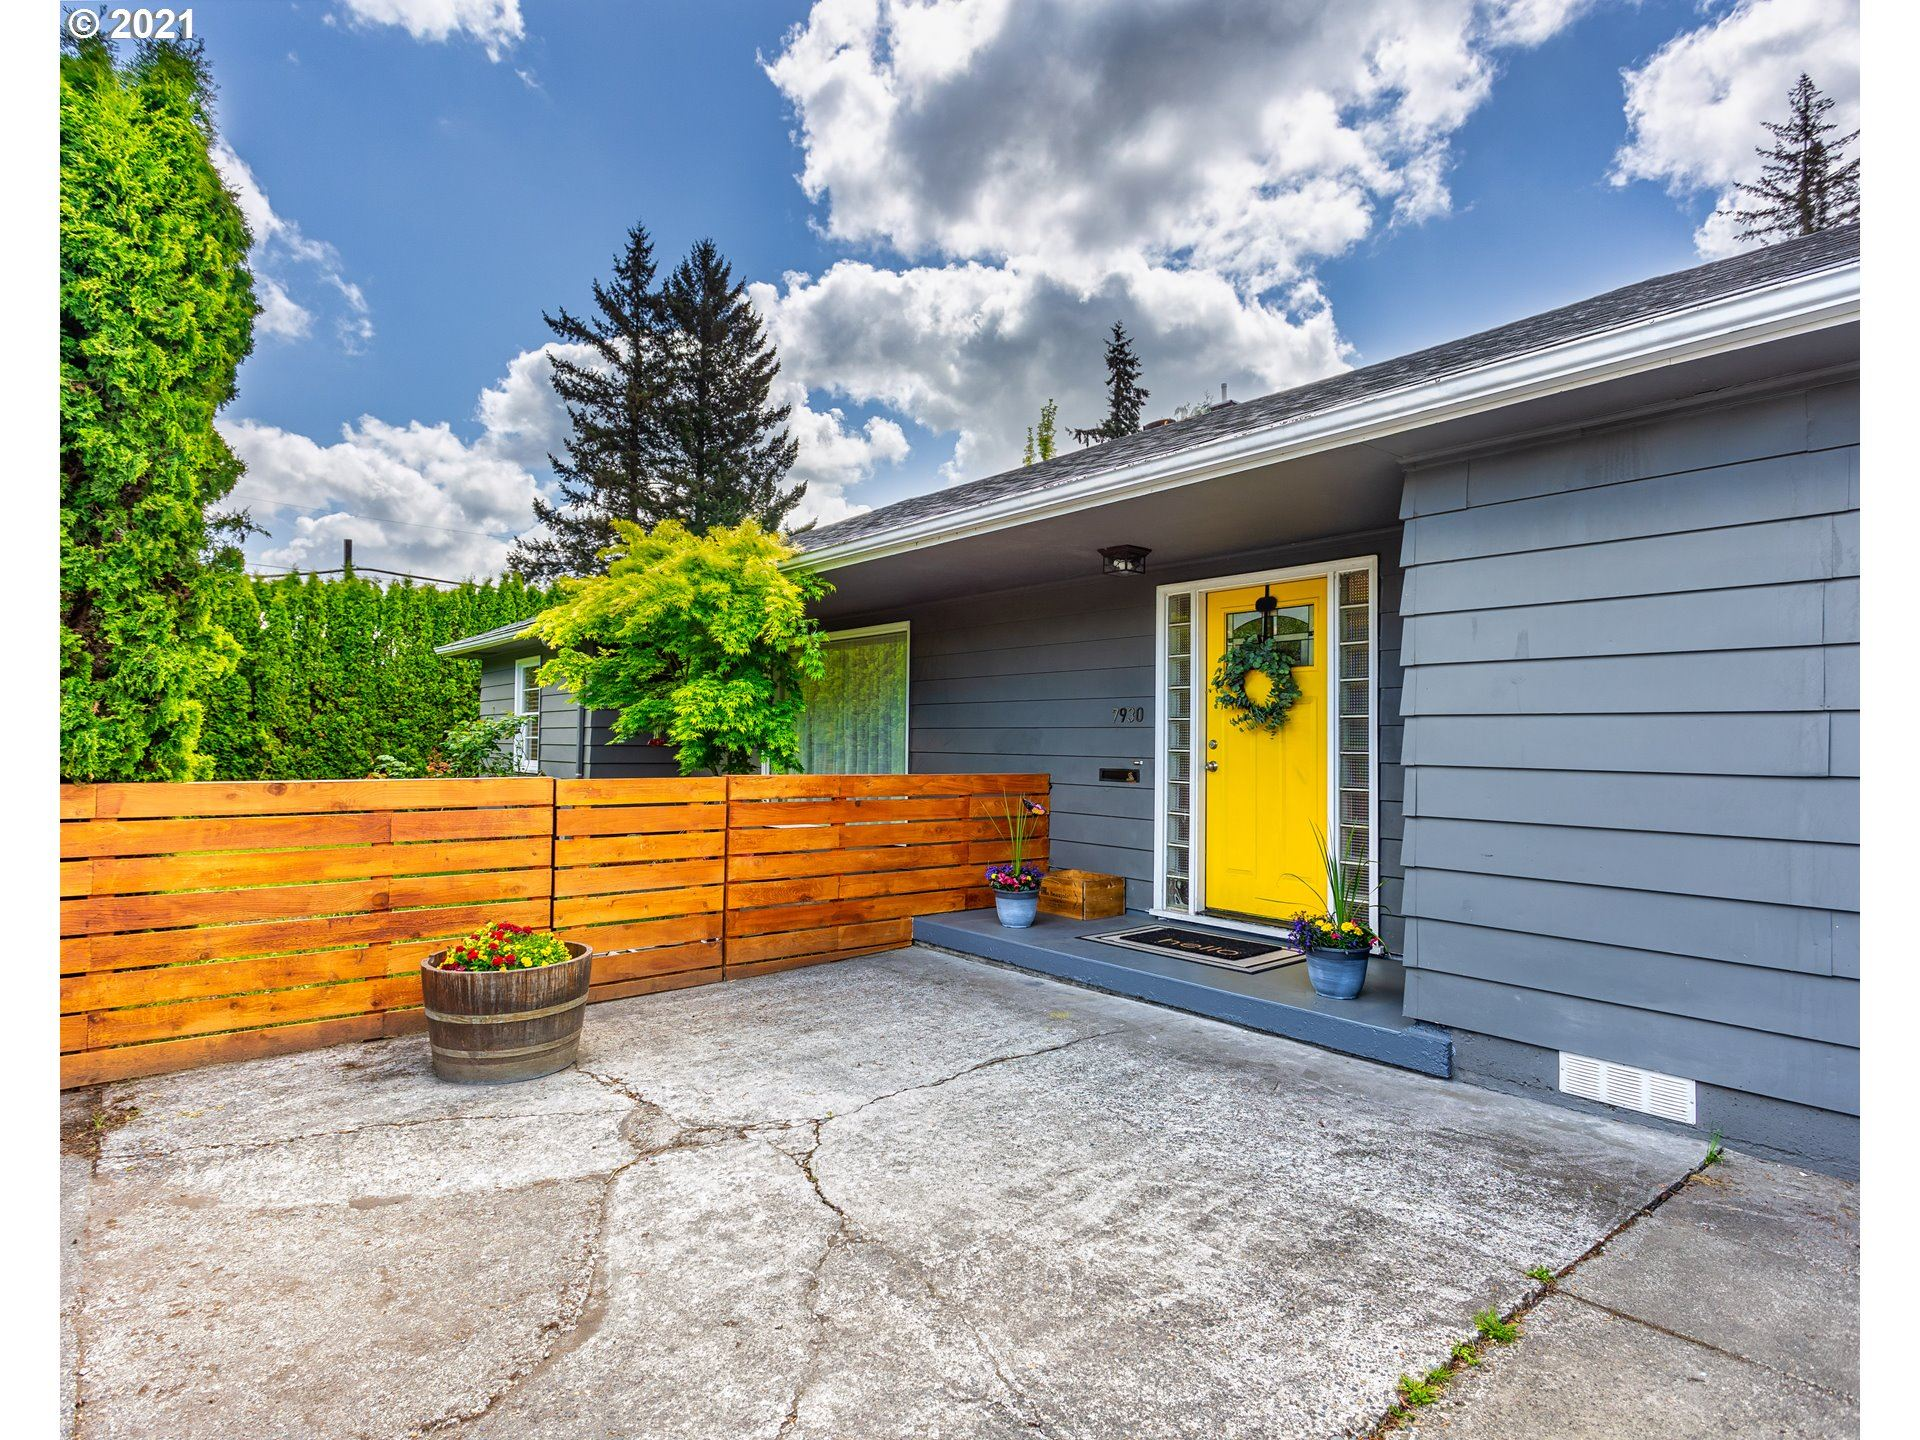 7930 NE PRESCOTT ST, Portland, OR 97218 - MLS#: 21121149